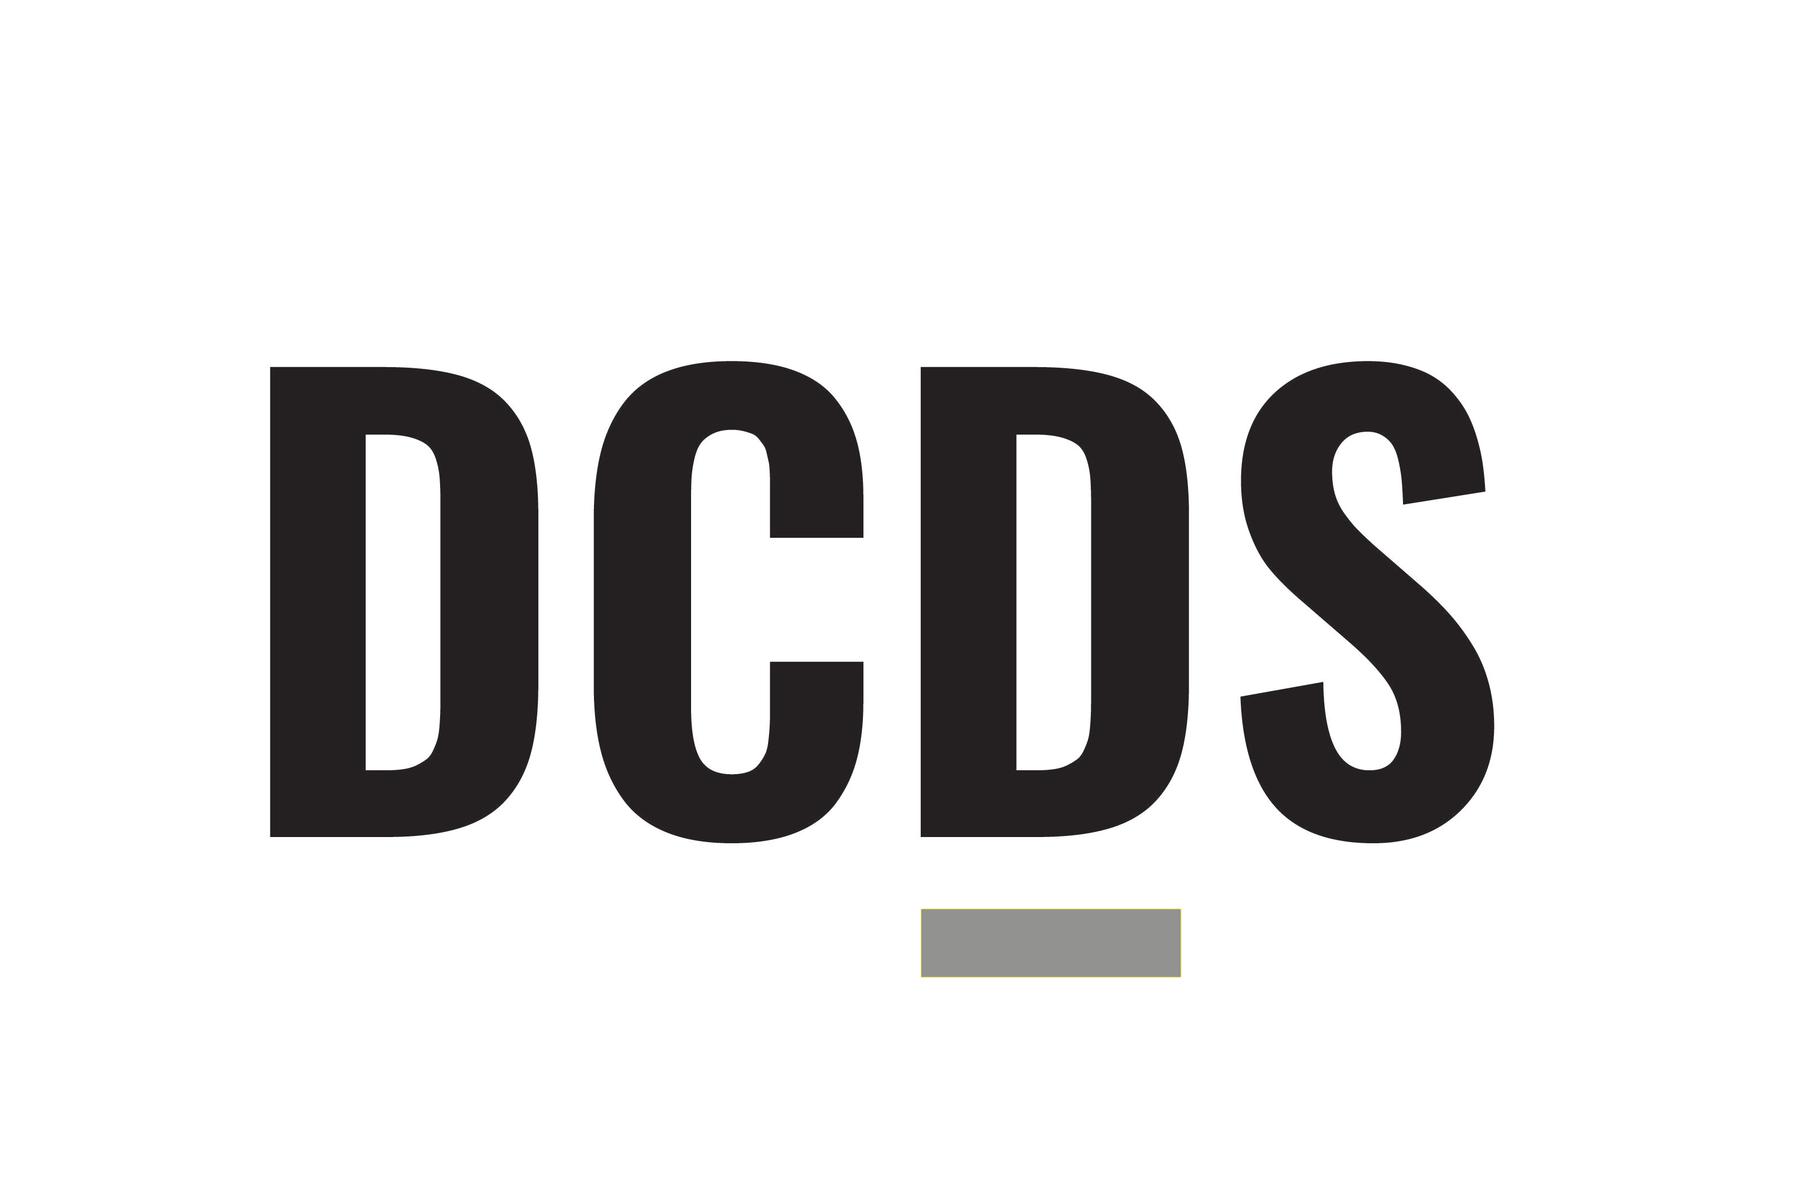 WordPress and Hubspot + Design and Development